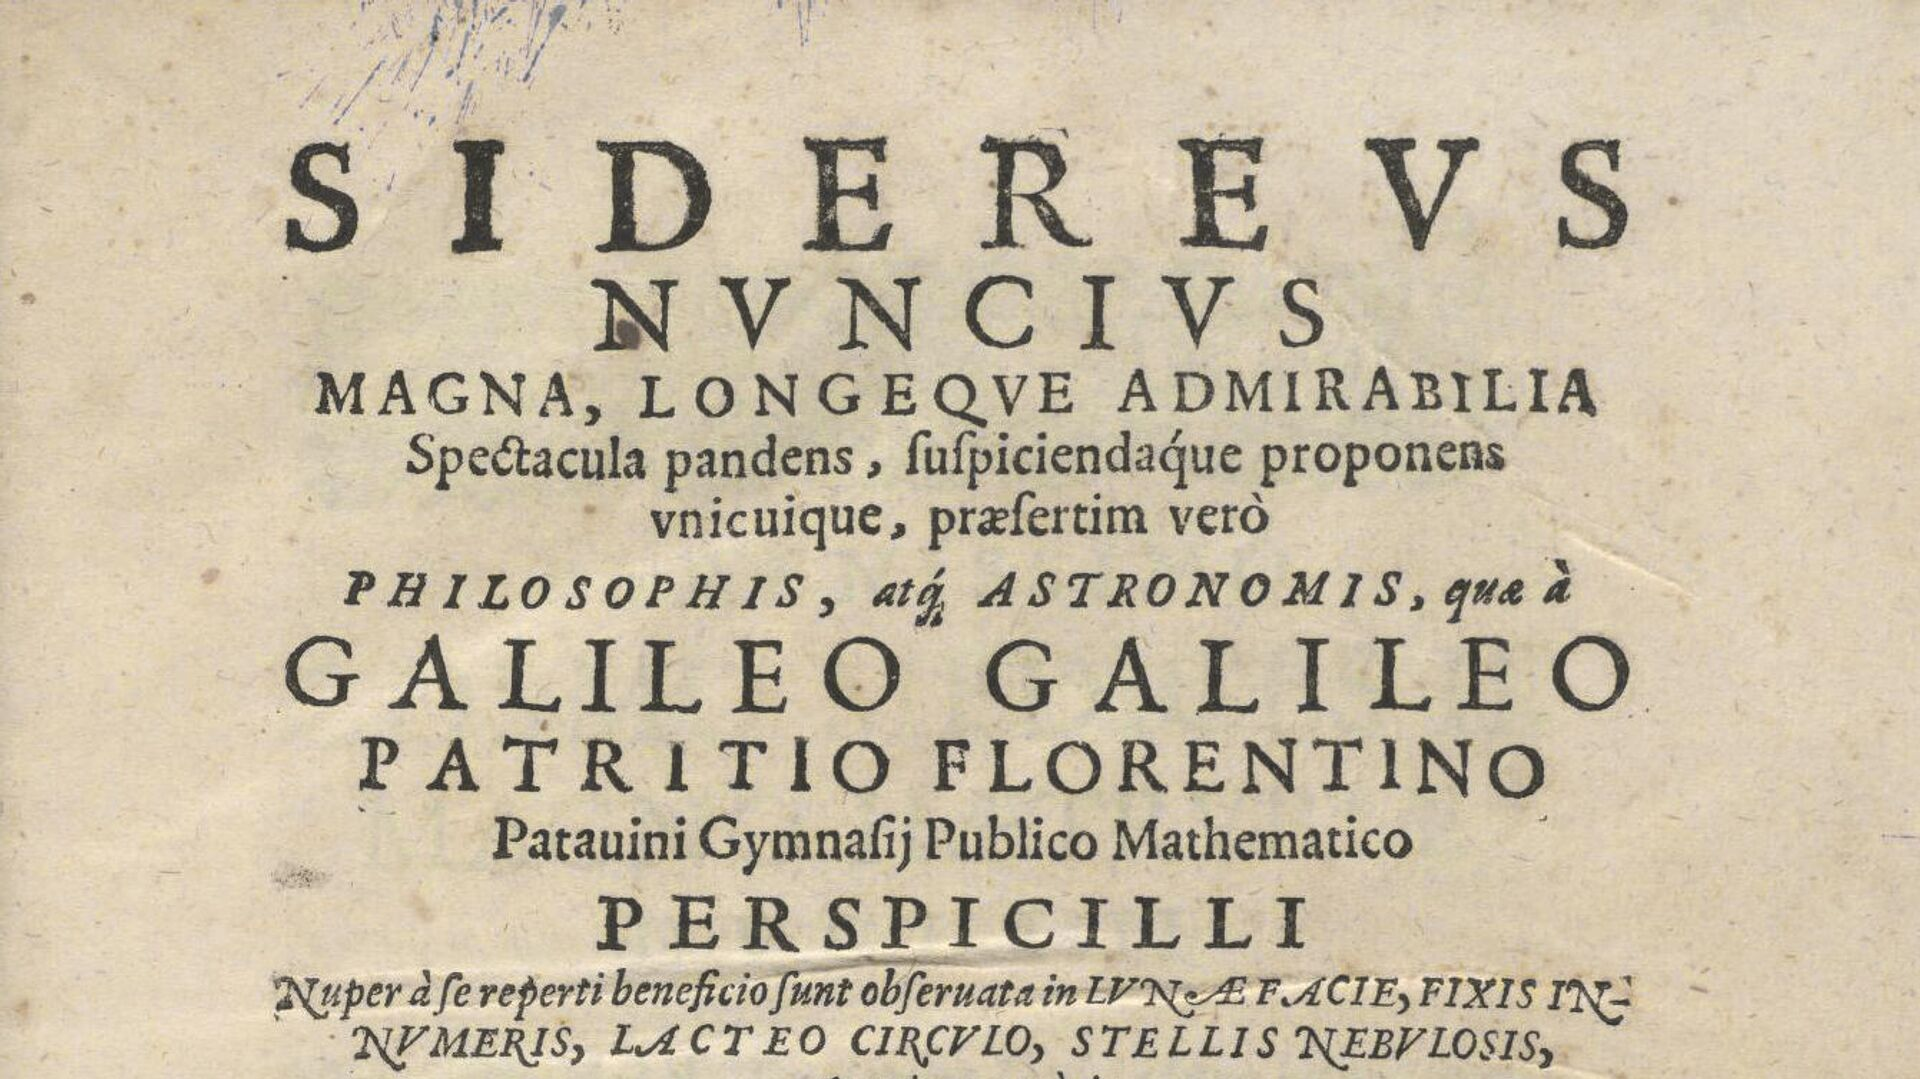 La primera página del tratado Sidereus Nuncius (Mensajero de las estrellas), escrito por Galileo Galilei - Sputnik Mundo, 1920, 14.03.2021